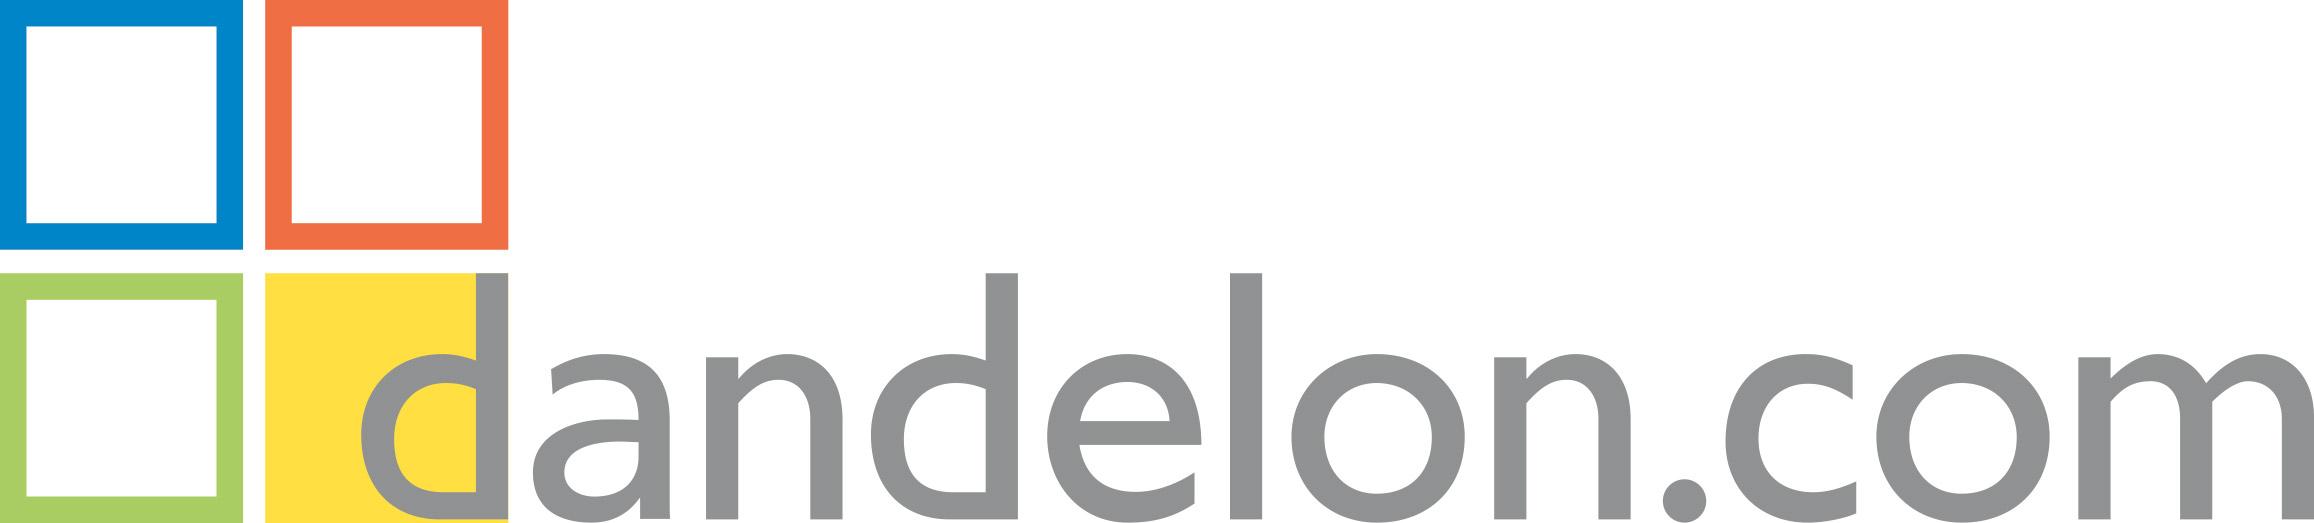 dandelon.com Logotype